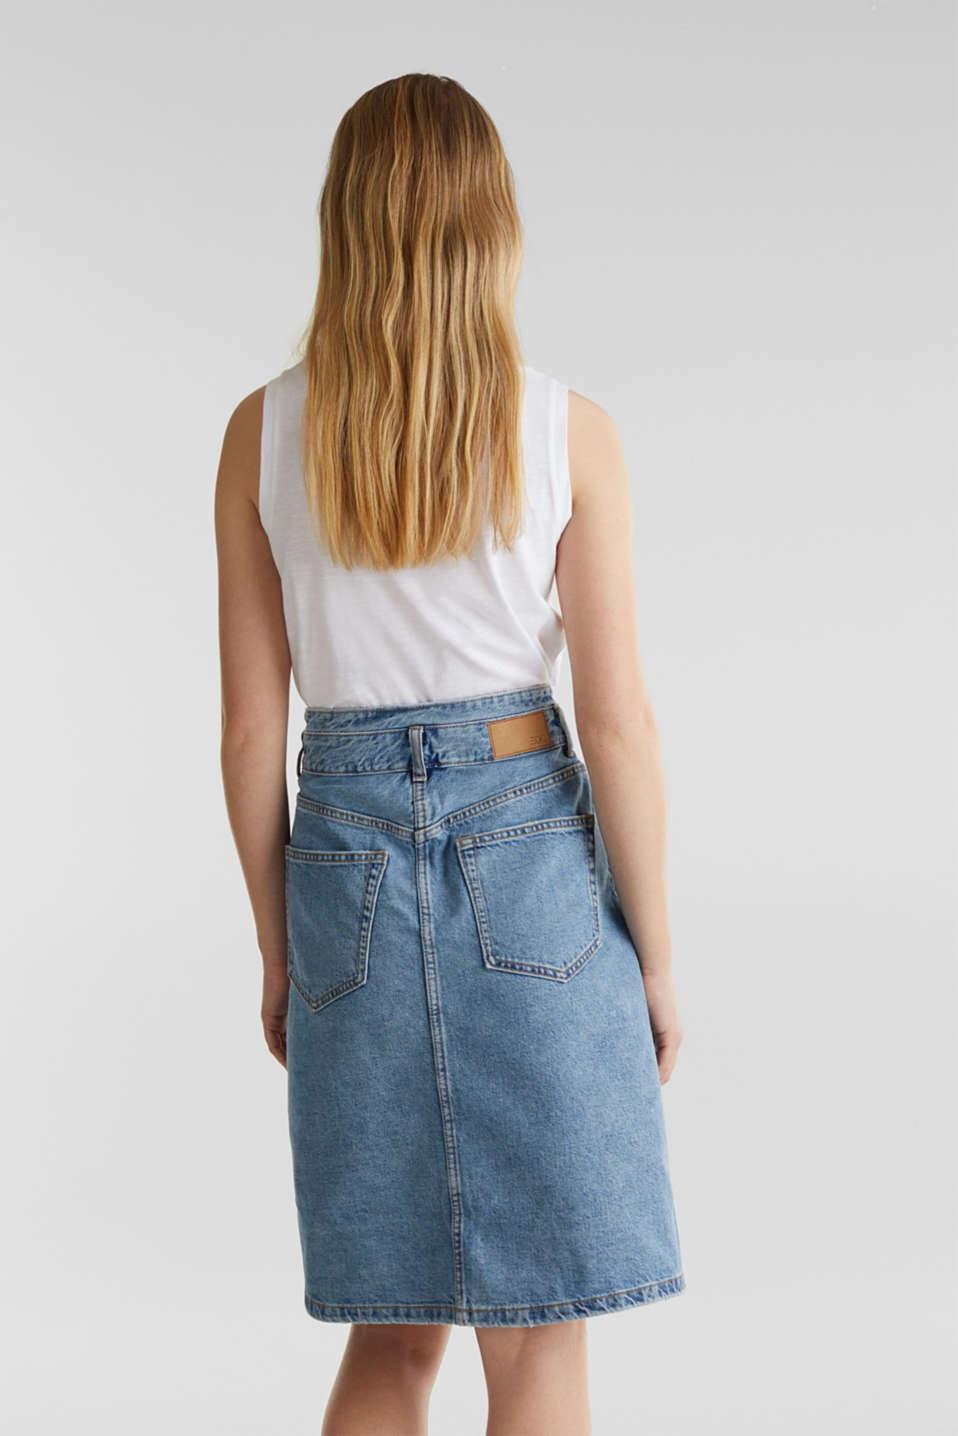 Denim skirt with neon details, BLUE MEDIUM WASH, detail image number 3